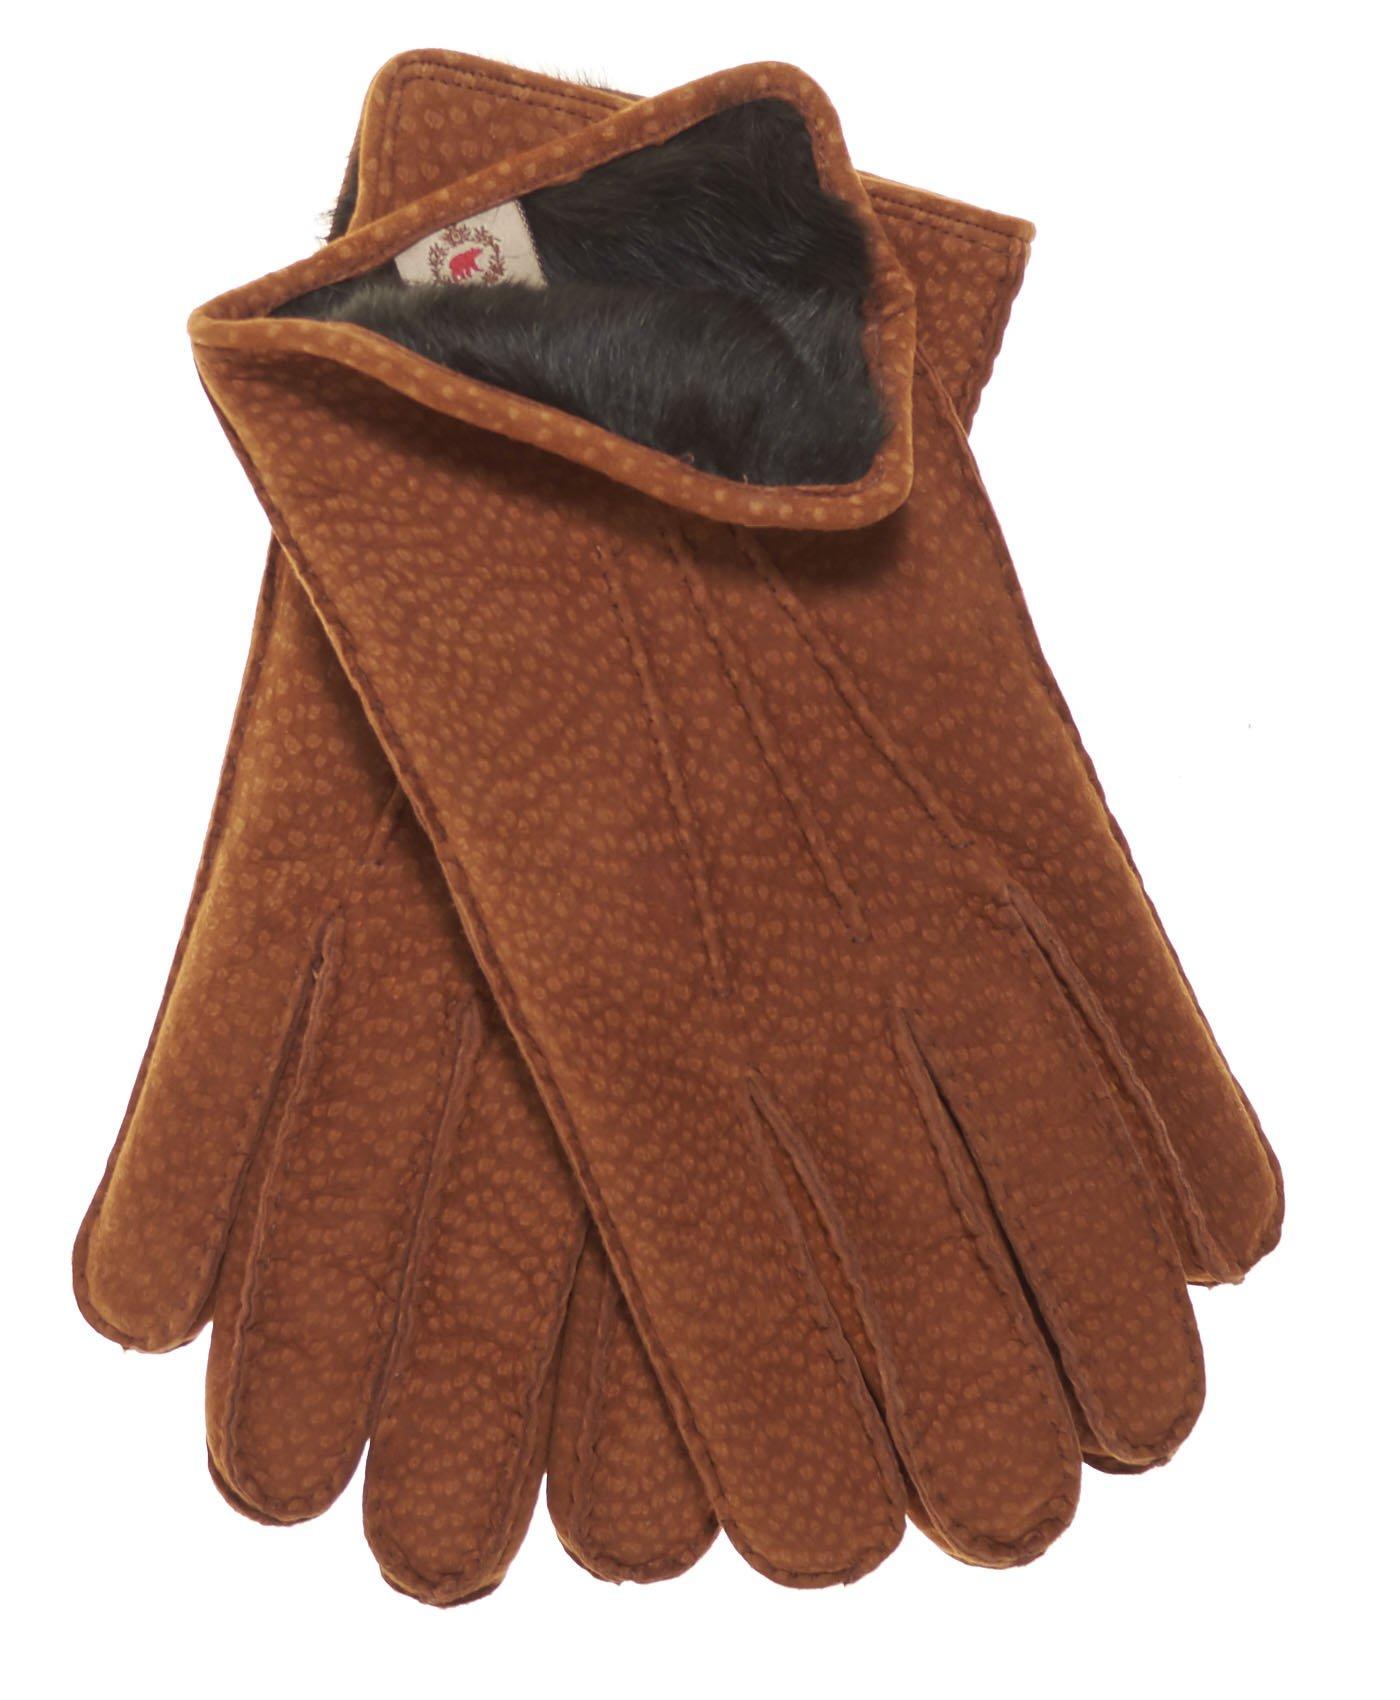 Fratelli Orsini Men's Handsewn Rabbit Fur Lined Italian Carpincho Dress Gloves Size 9 Color Cork